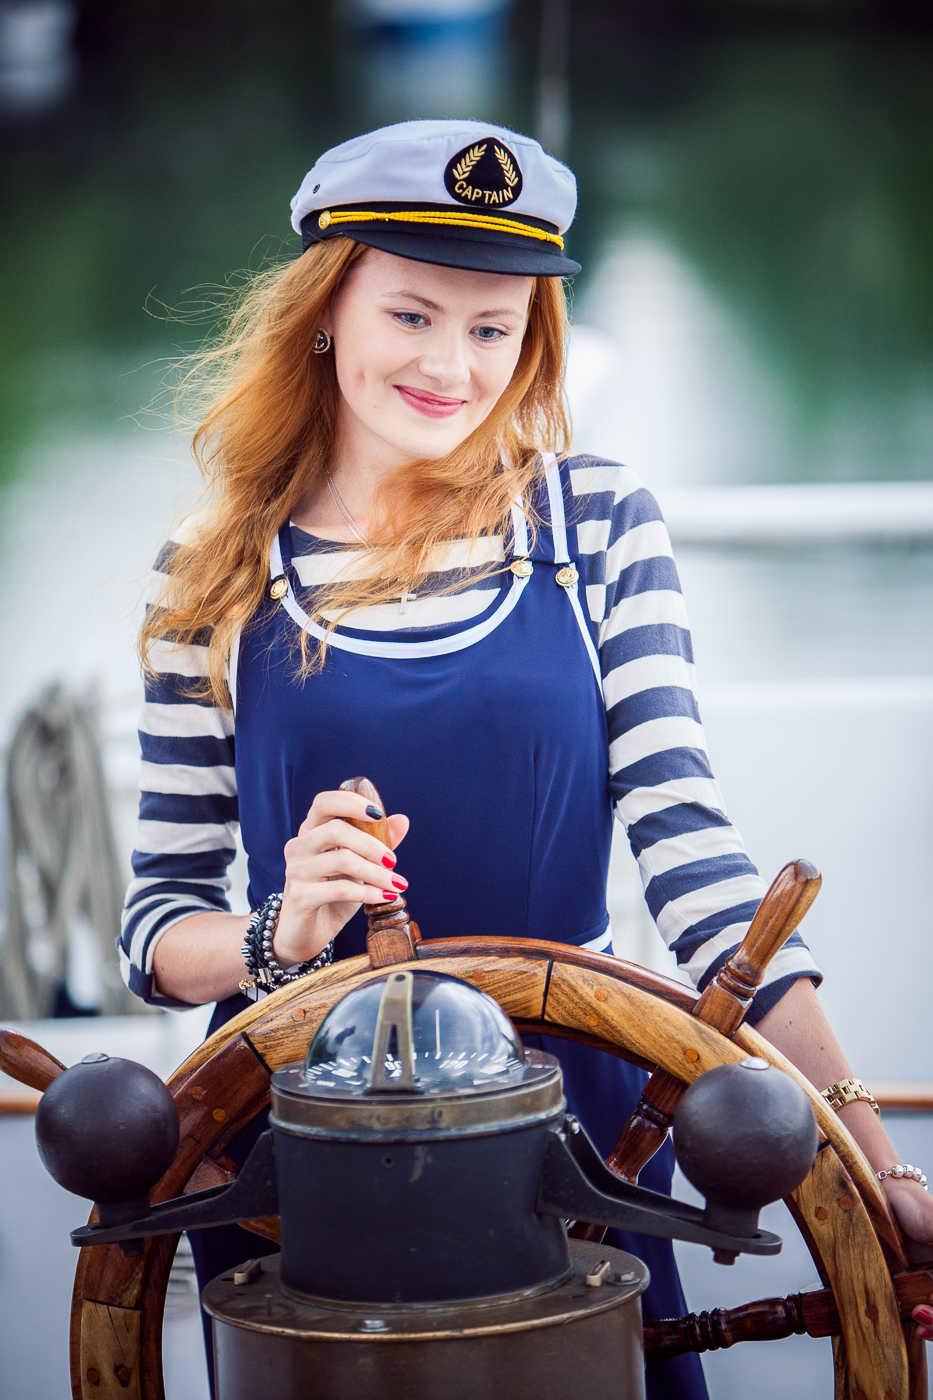 Lizzy Steering Boat